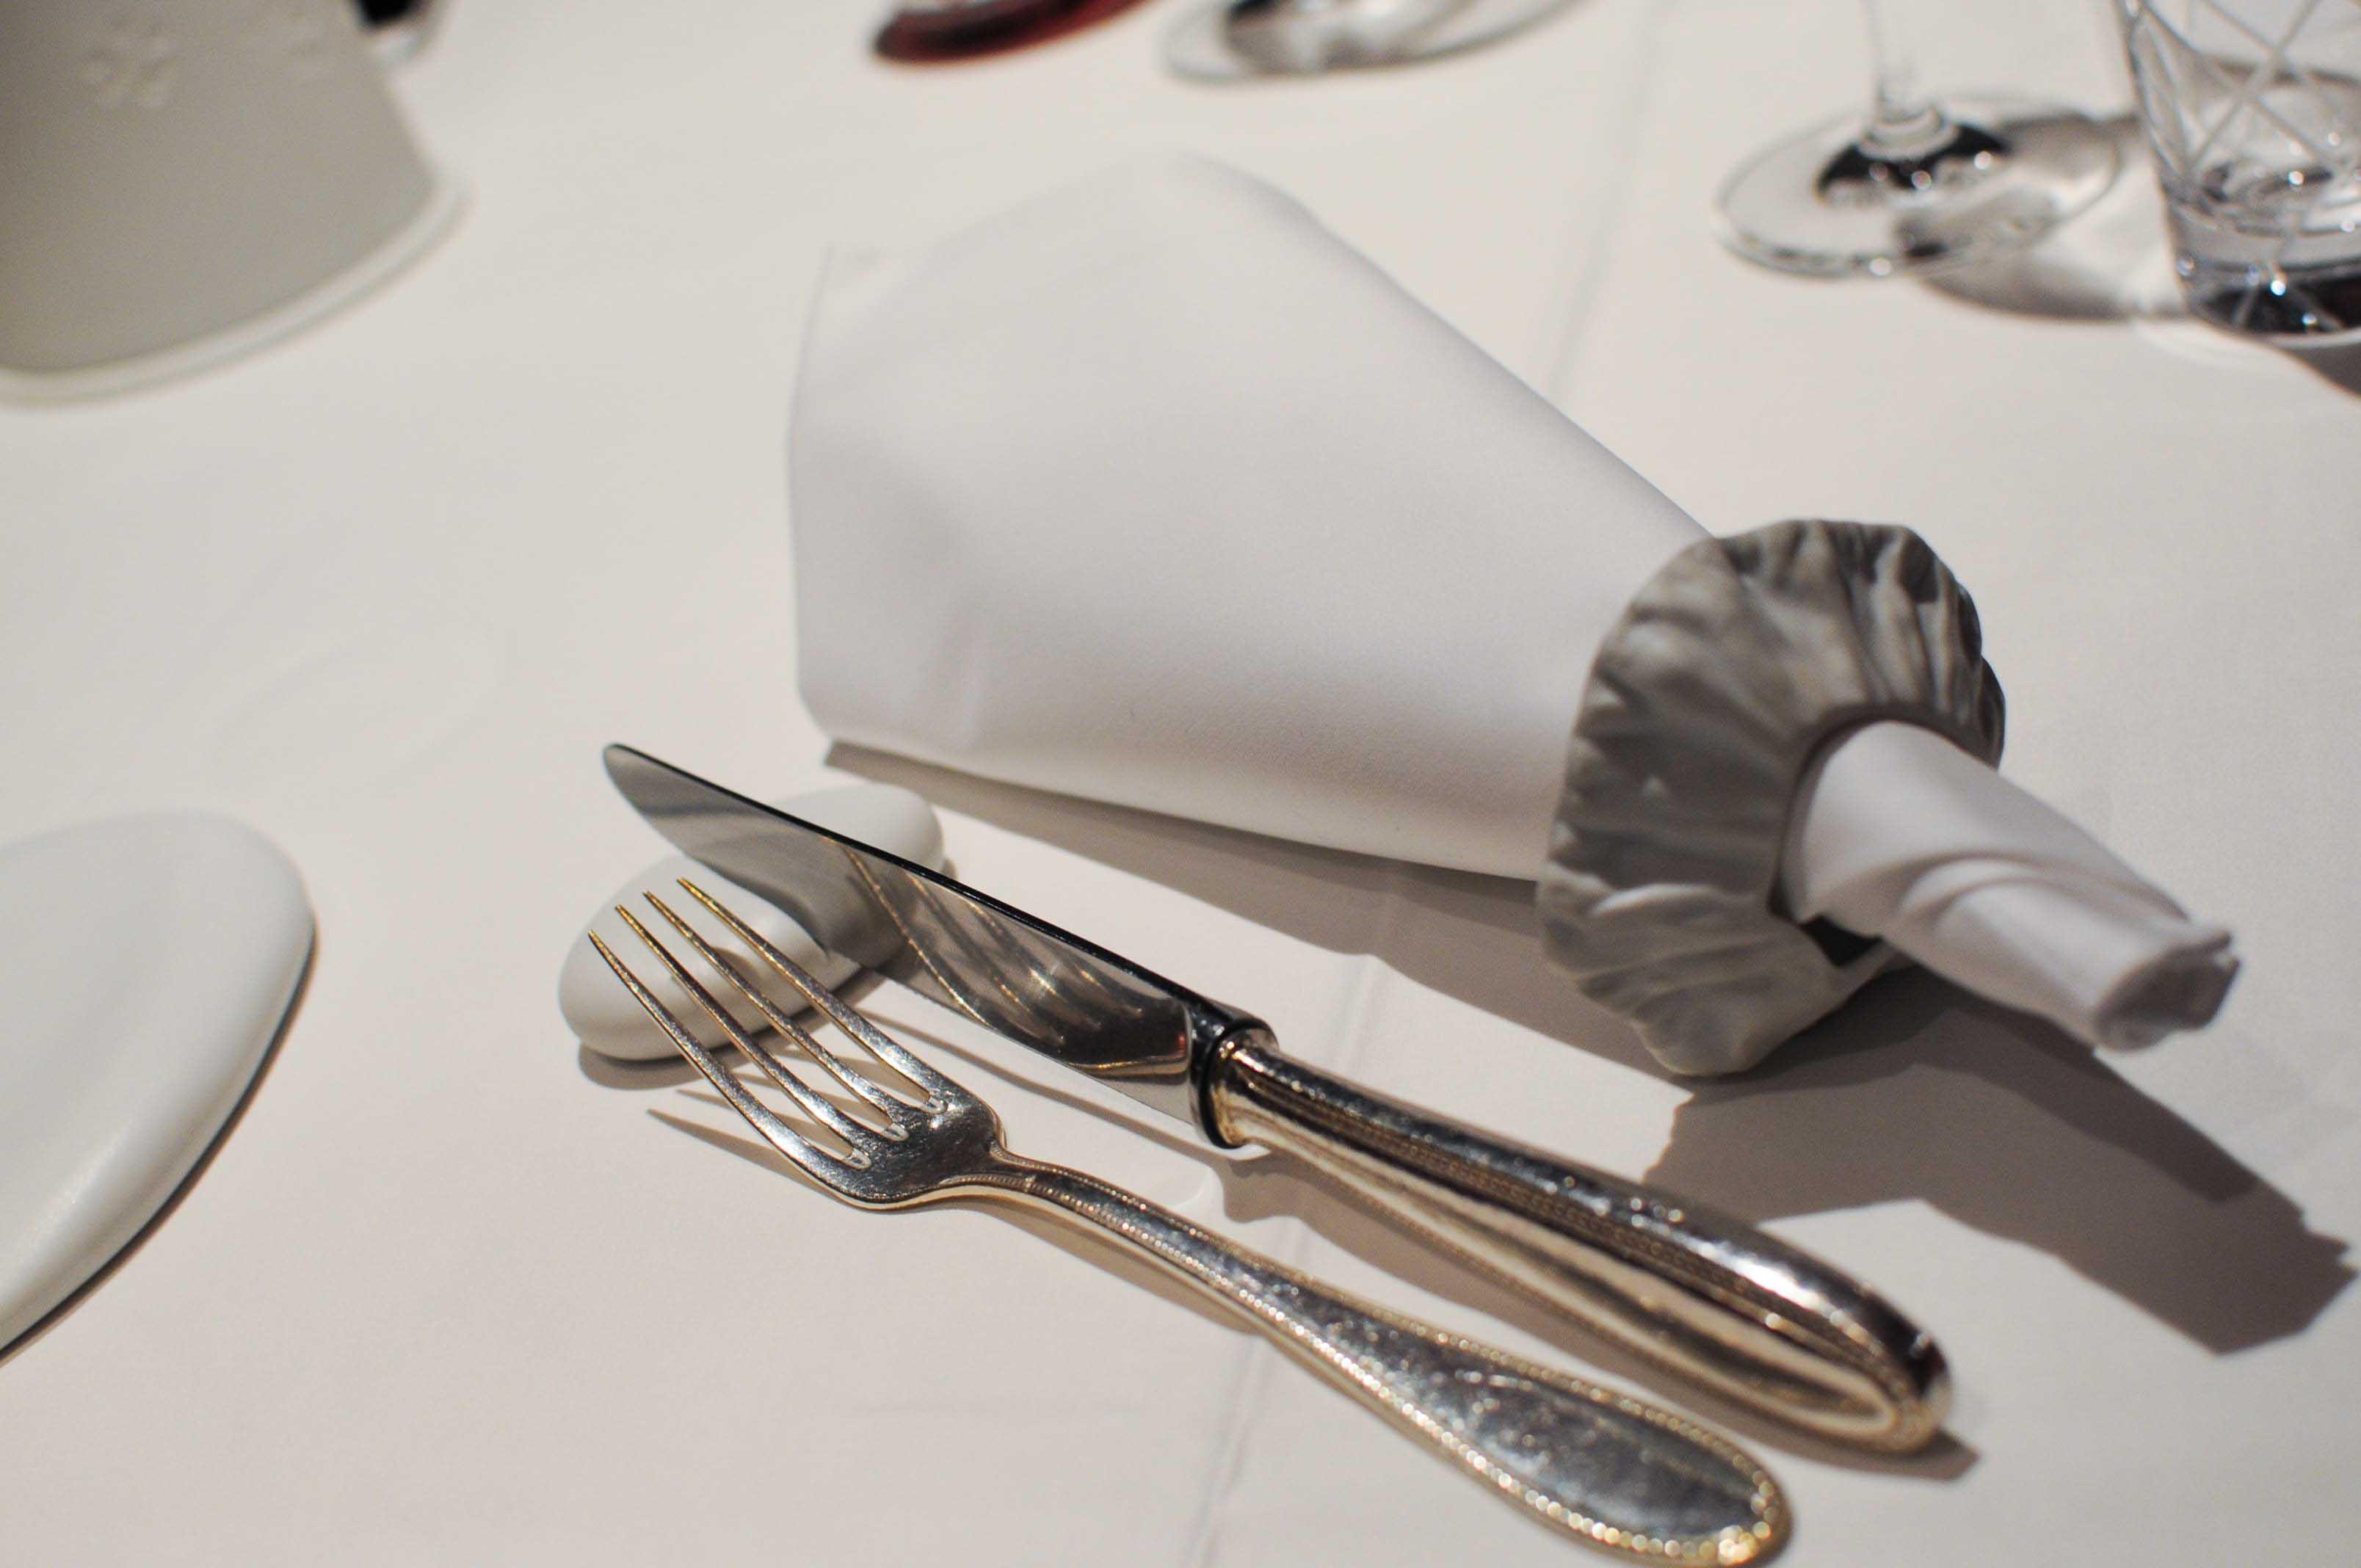 La table du gourmet riquewihr 8 - Restaurant riquewihr table du gourmet ...